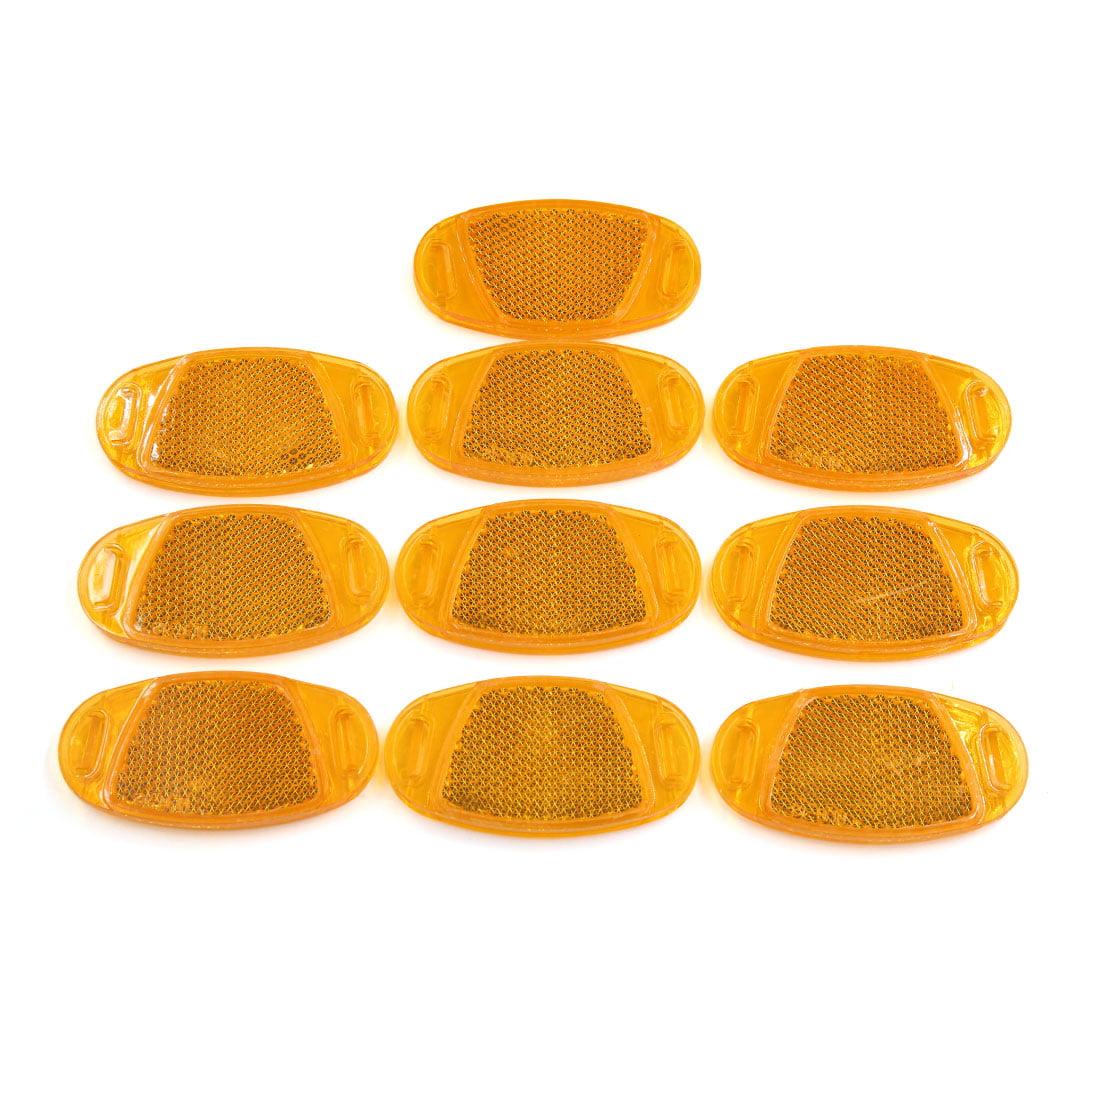 10pcs Orange Oval Plastic Spoke Reflective Warning Reflector for Bike Bicycle